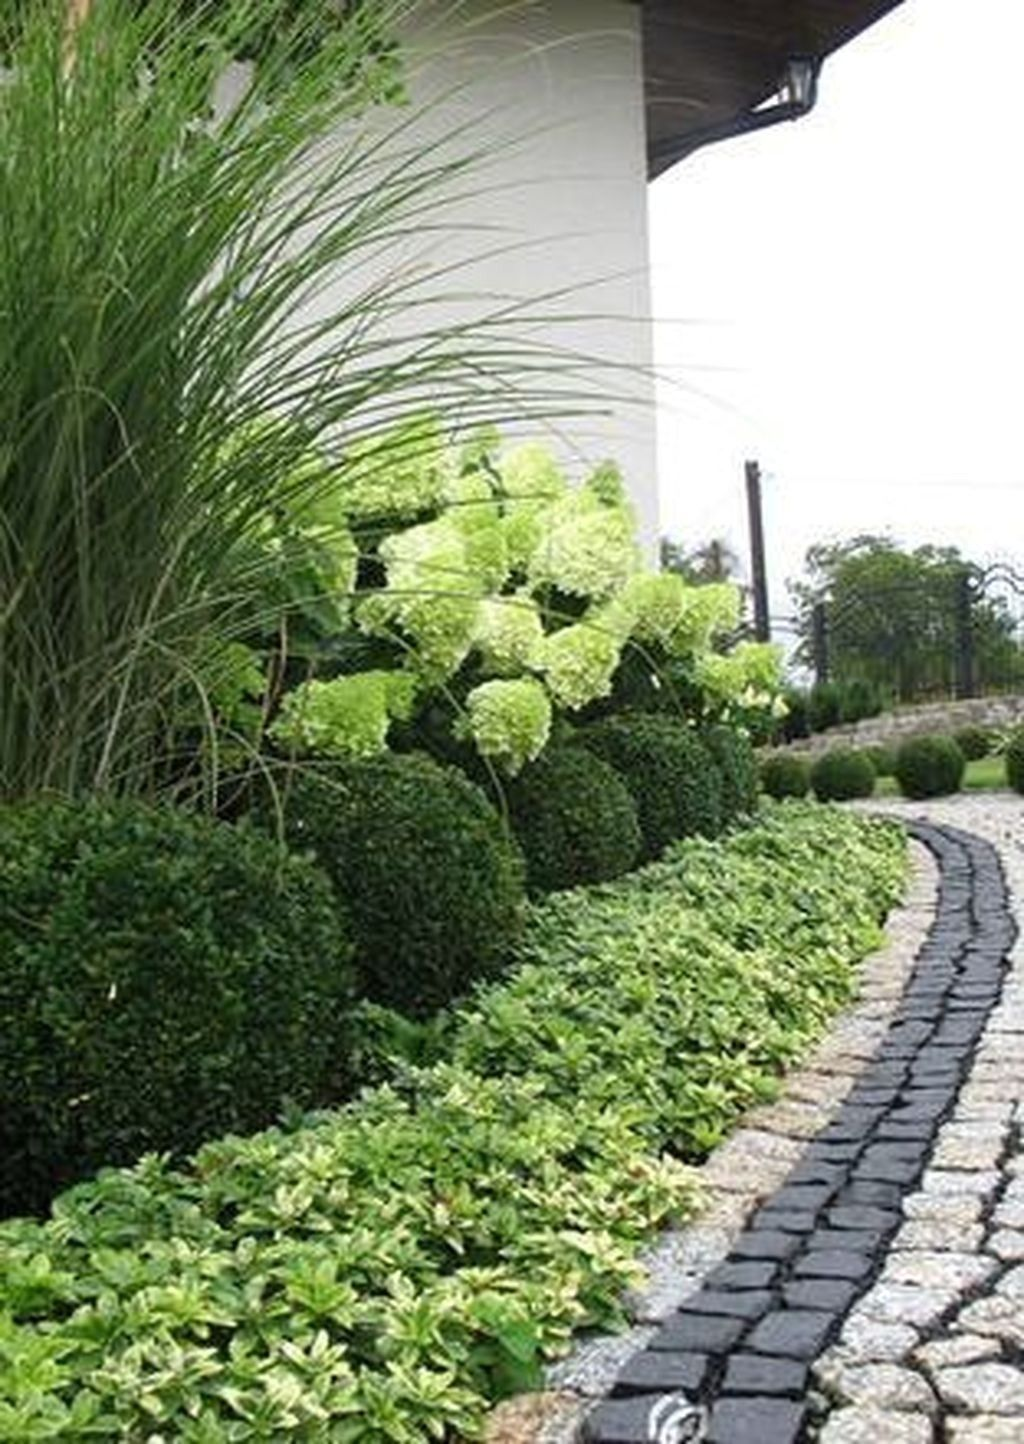 77 Gorgeous Hydrangeas Landscaping Design Ideas Home Decor Diy Design 77 Gorgeous In 2020 Hydrangea Landscaping Landscape Design Garden Landscape Design